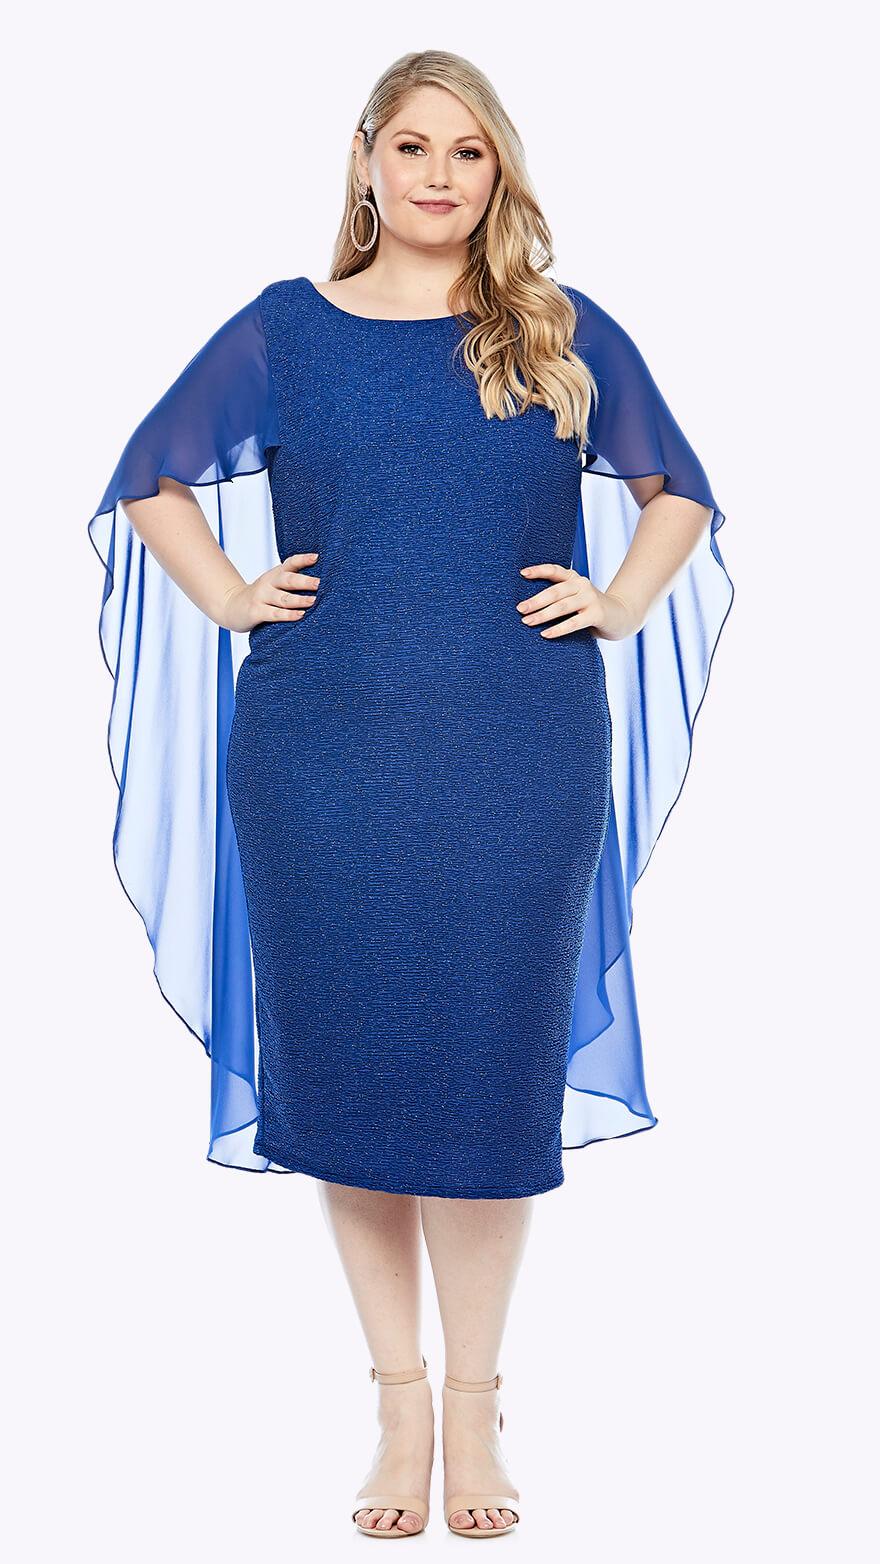 LJ0386 Knee-length stretch lurex dress with chiffon cape